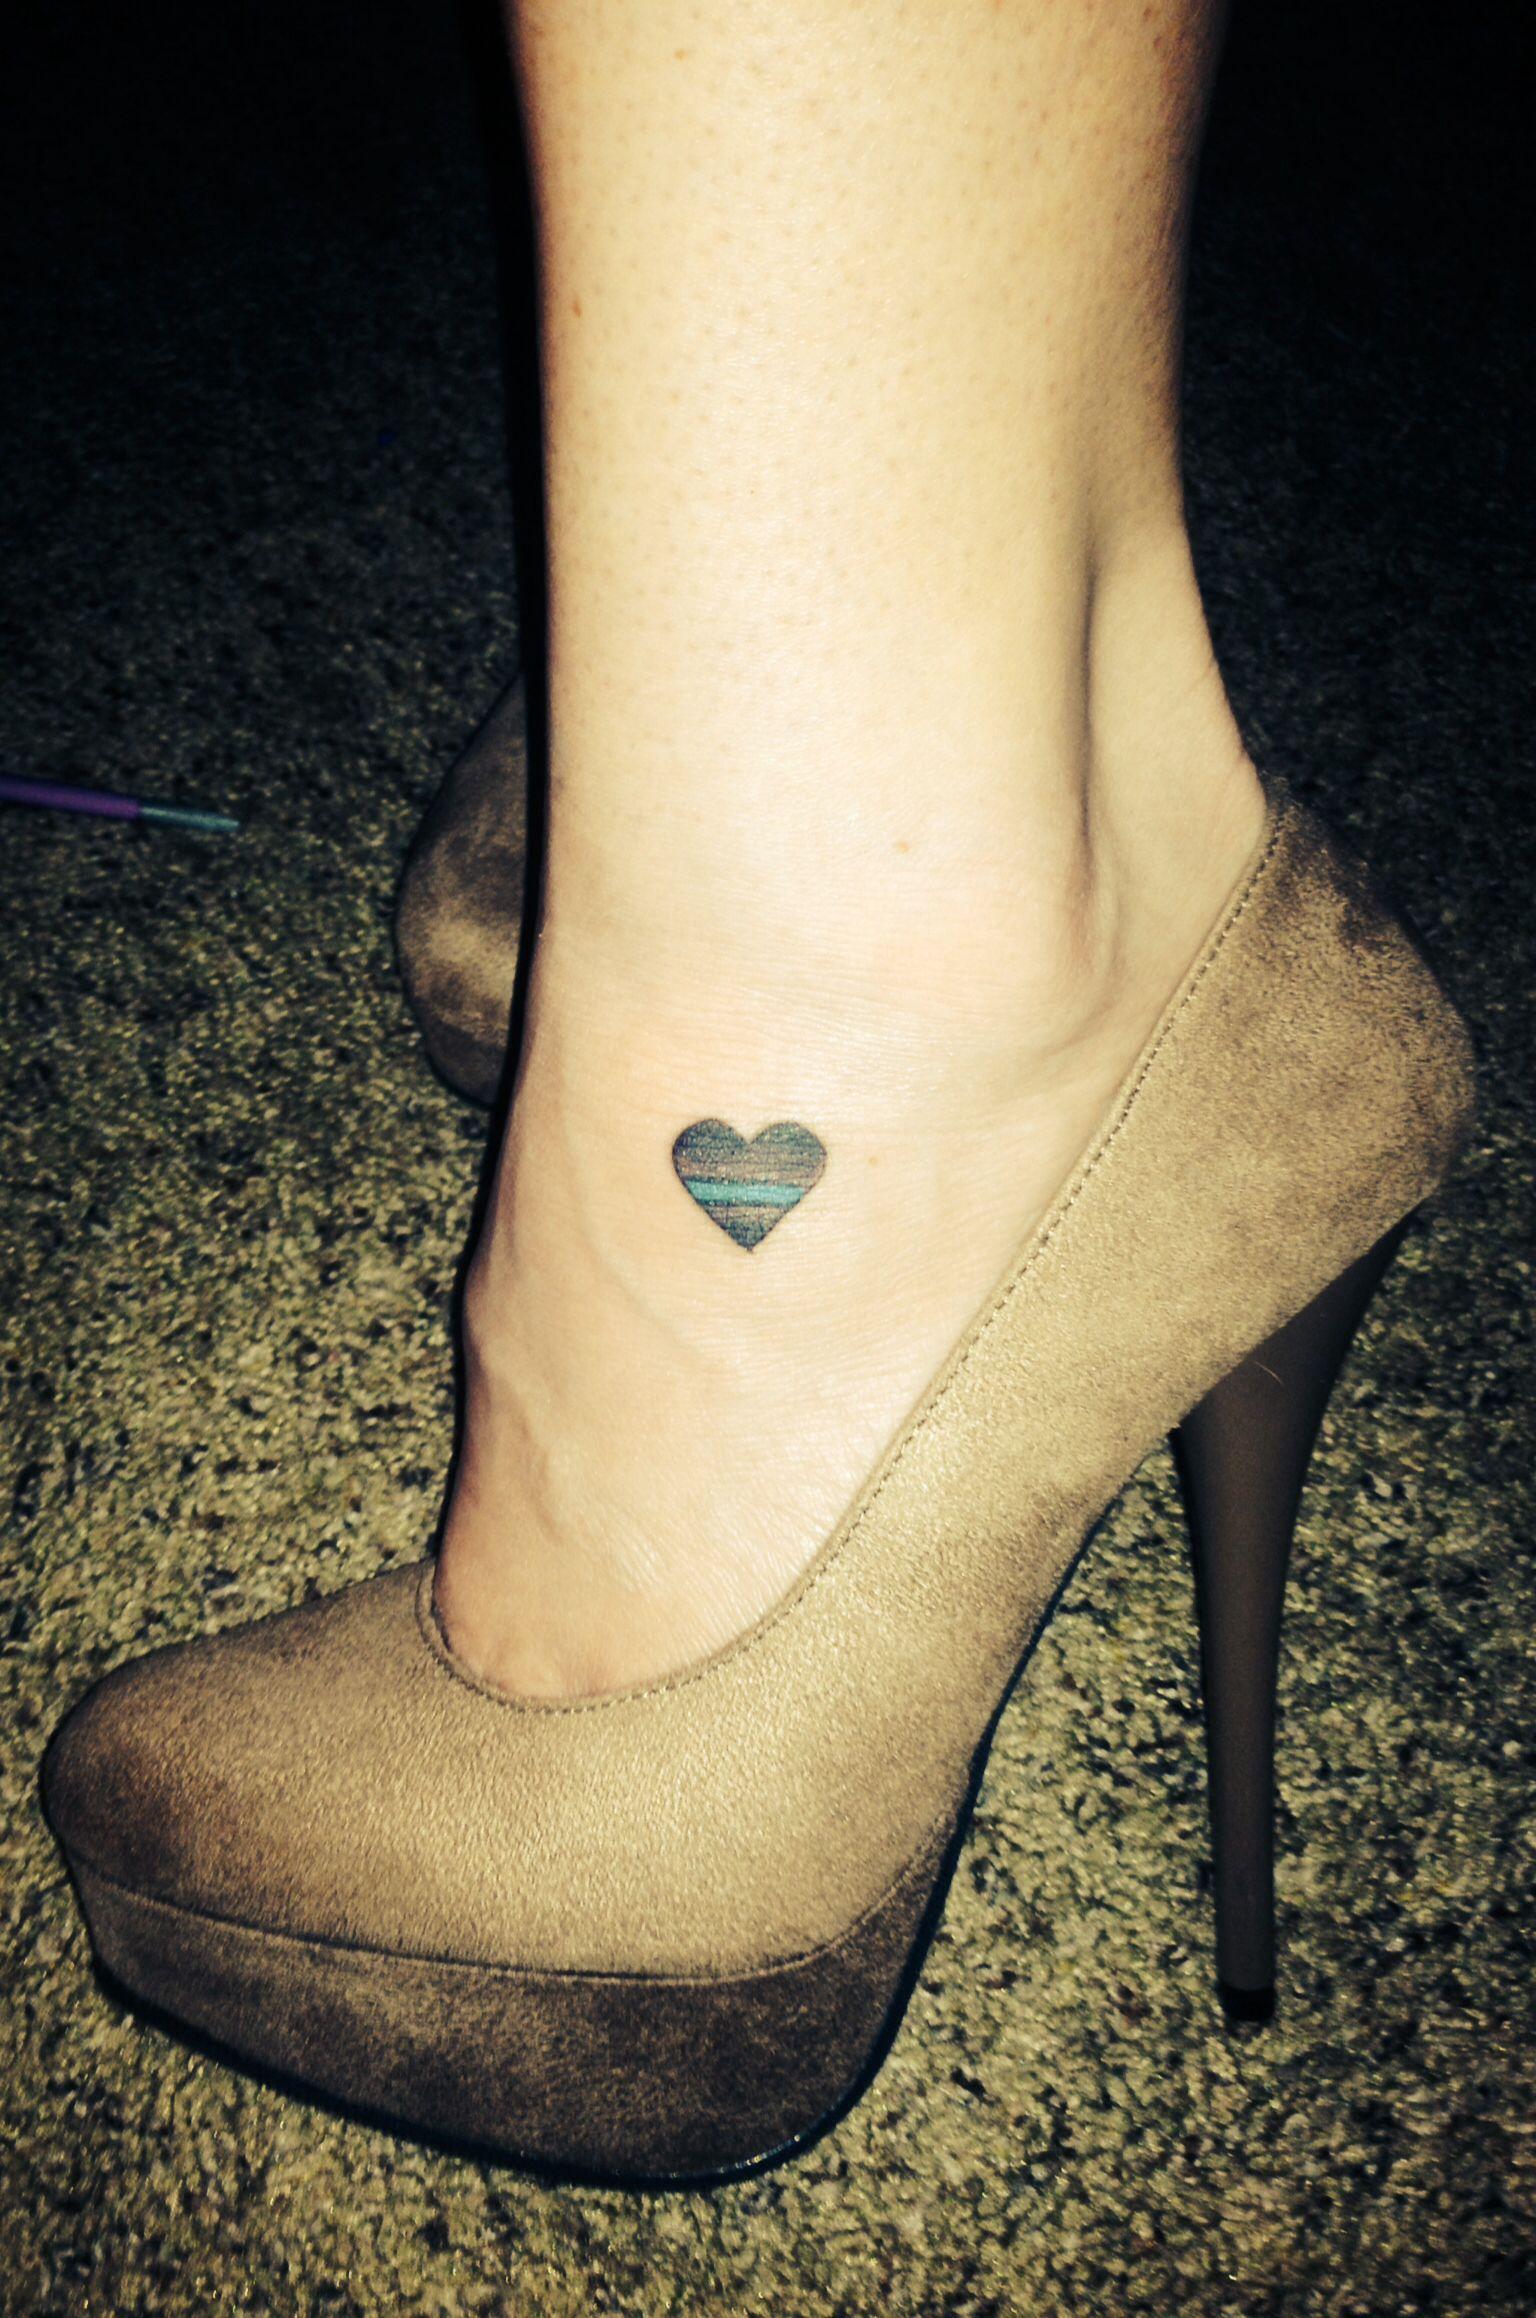 Heart Thin Blue Line Tattoo